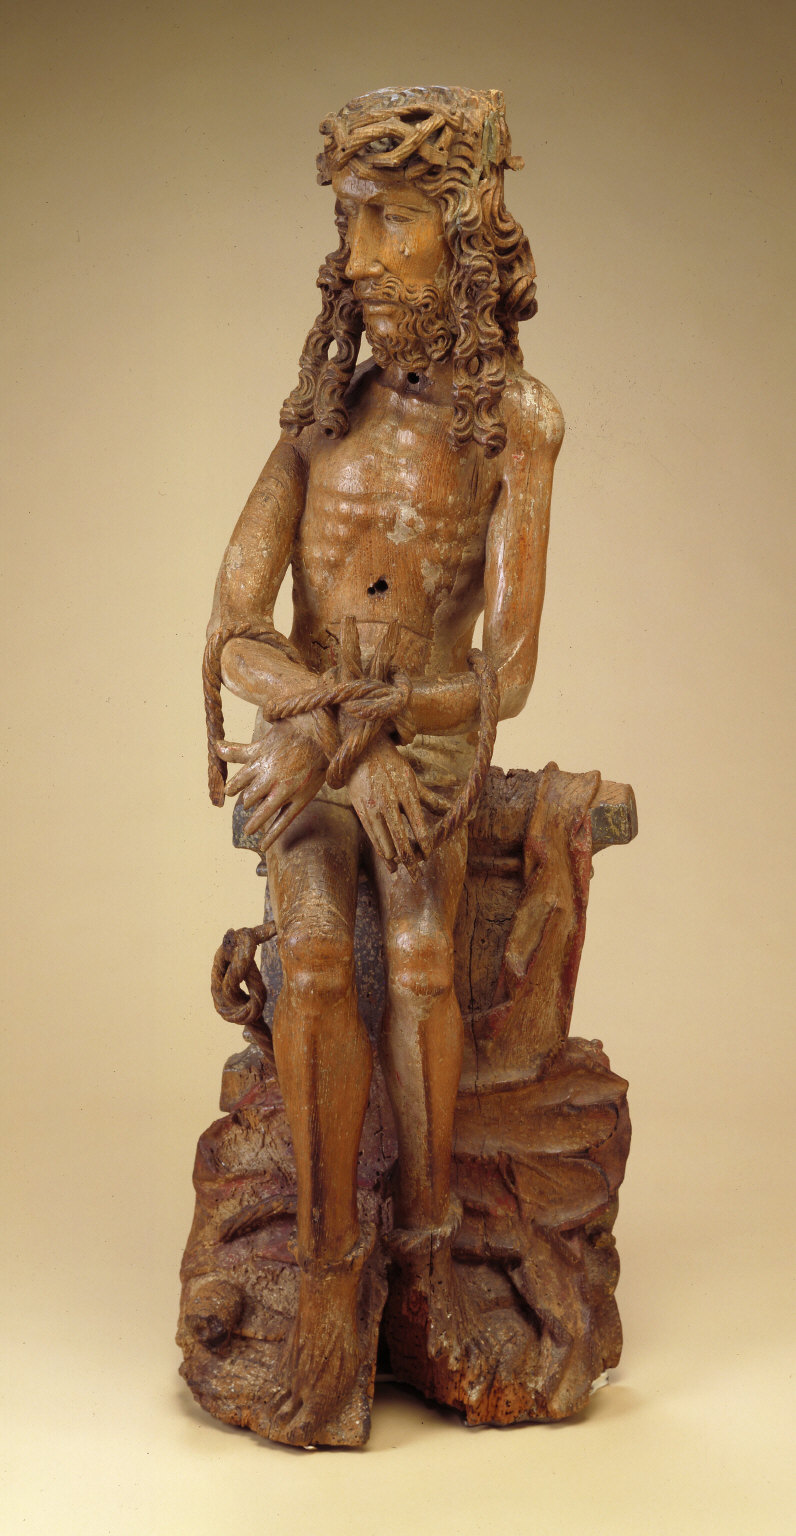 Christ in Sorrow